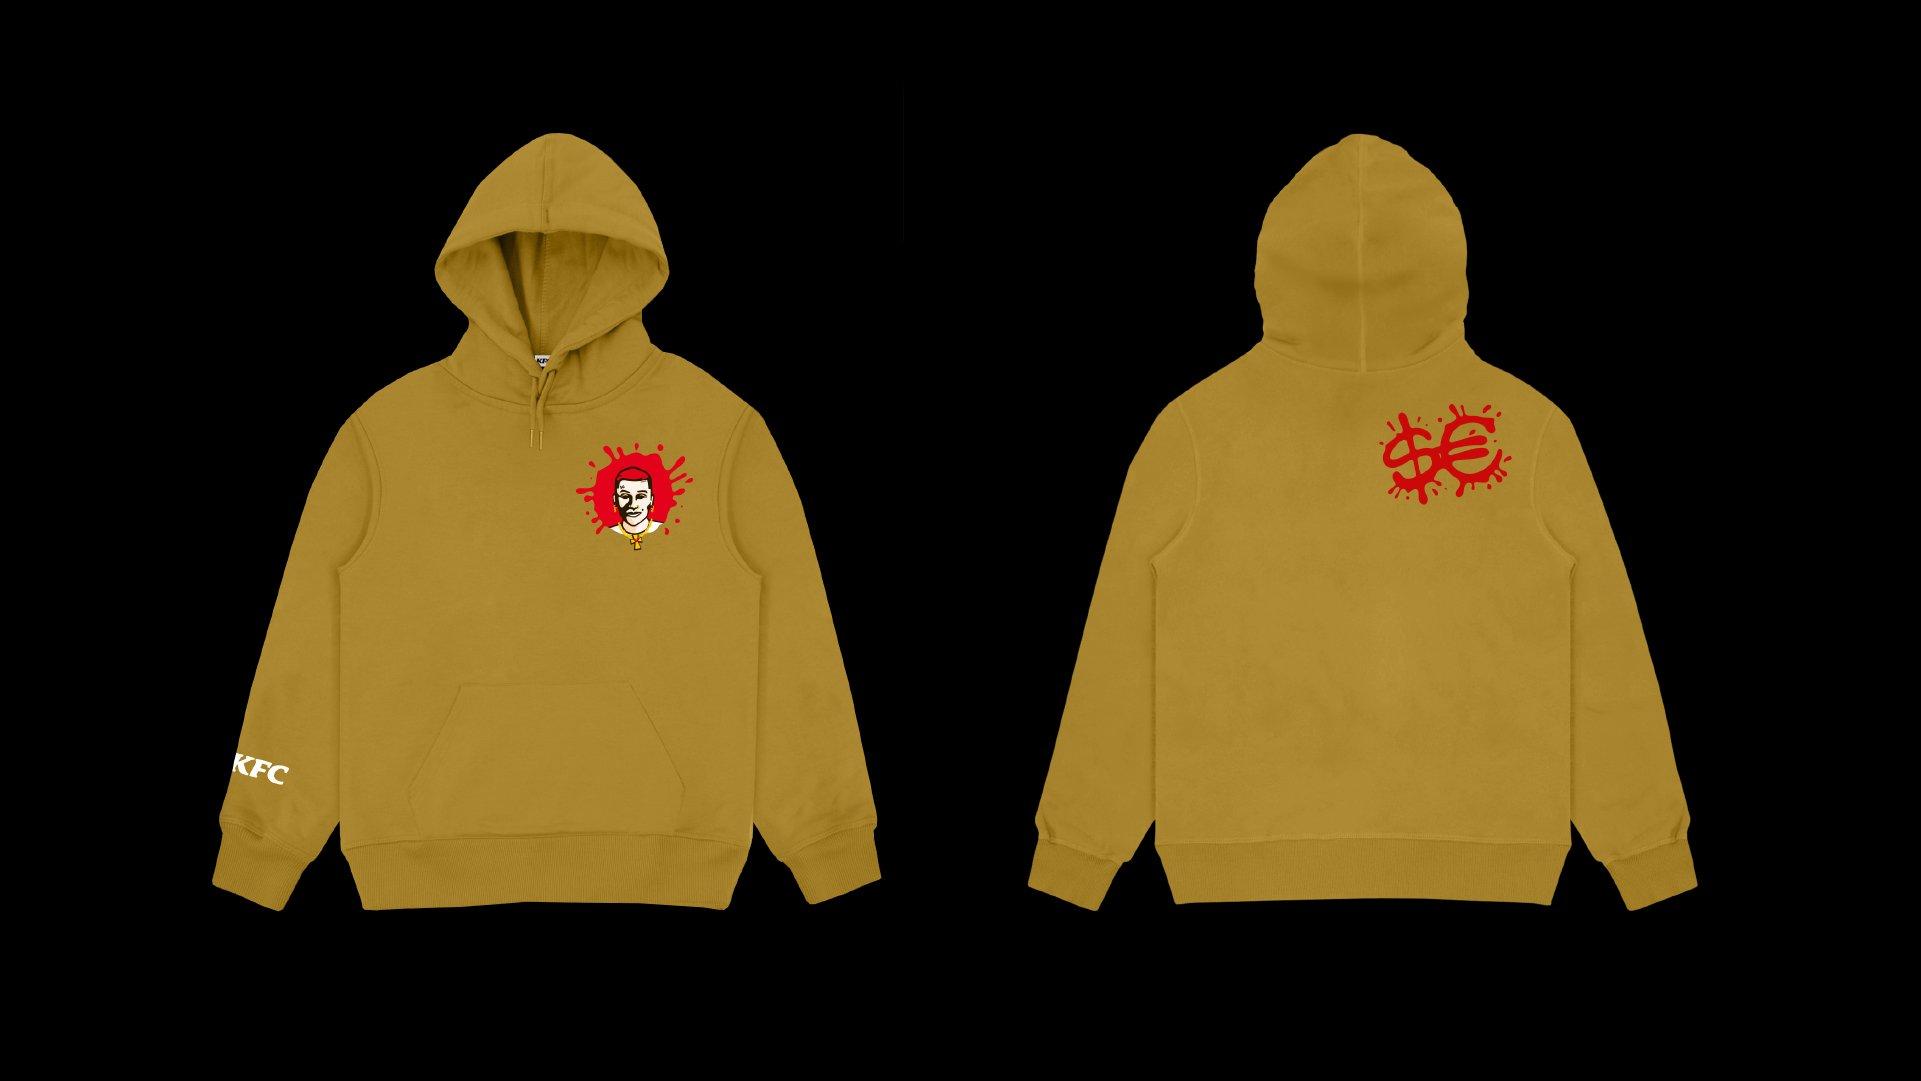 SFERA KFC MERCH 2020 hoodies 02